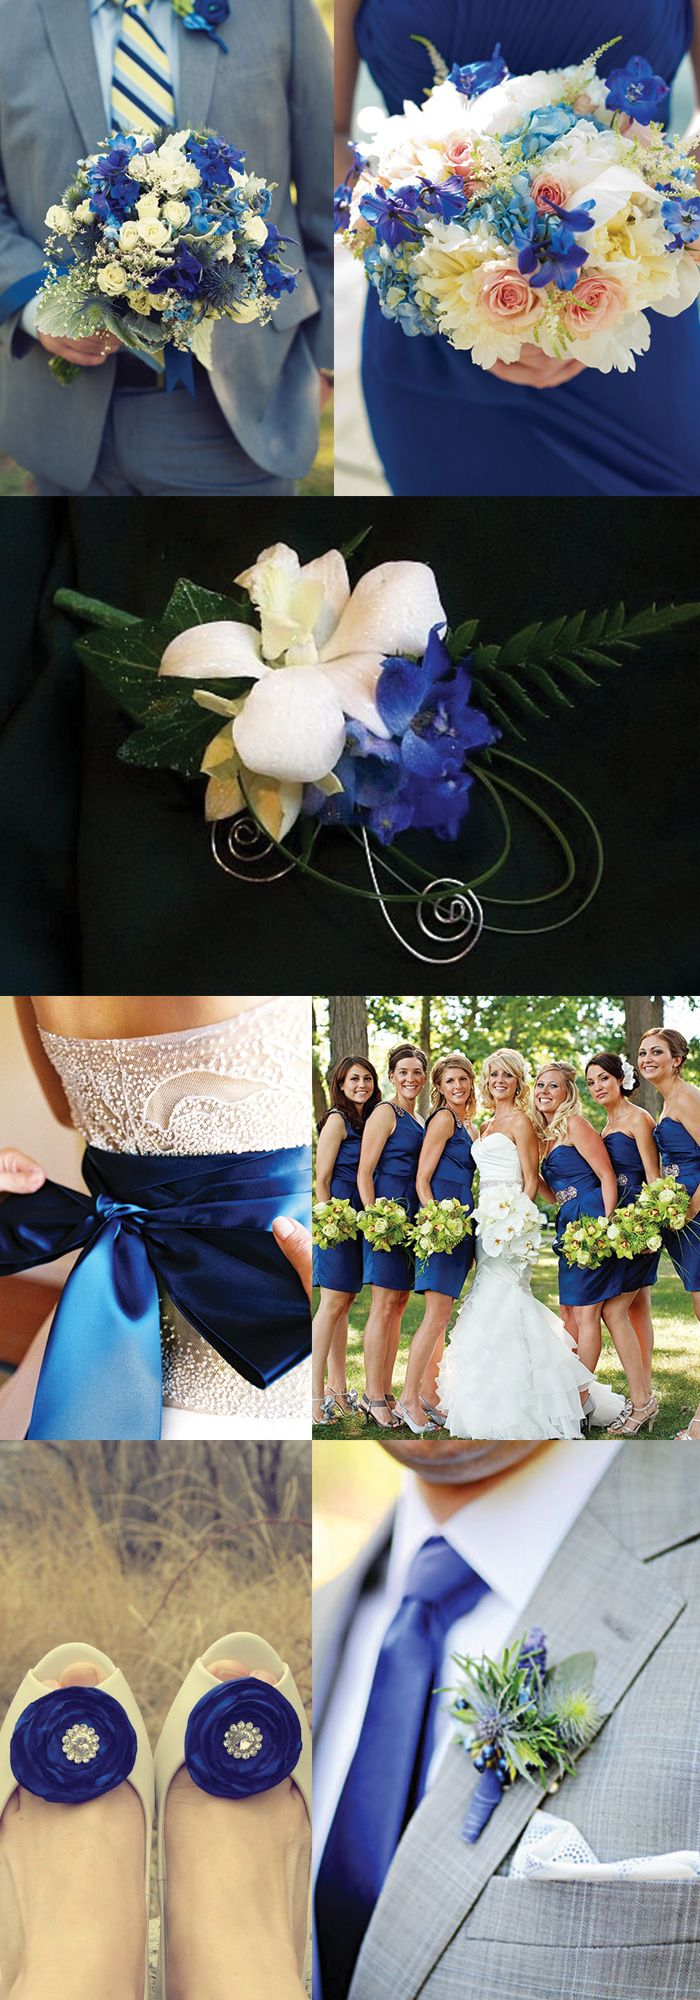 Horizon Blue Wedding Ideas to Swoon Over.